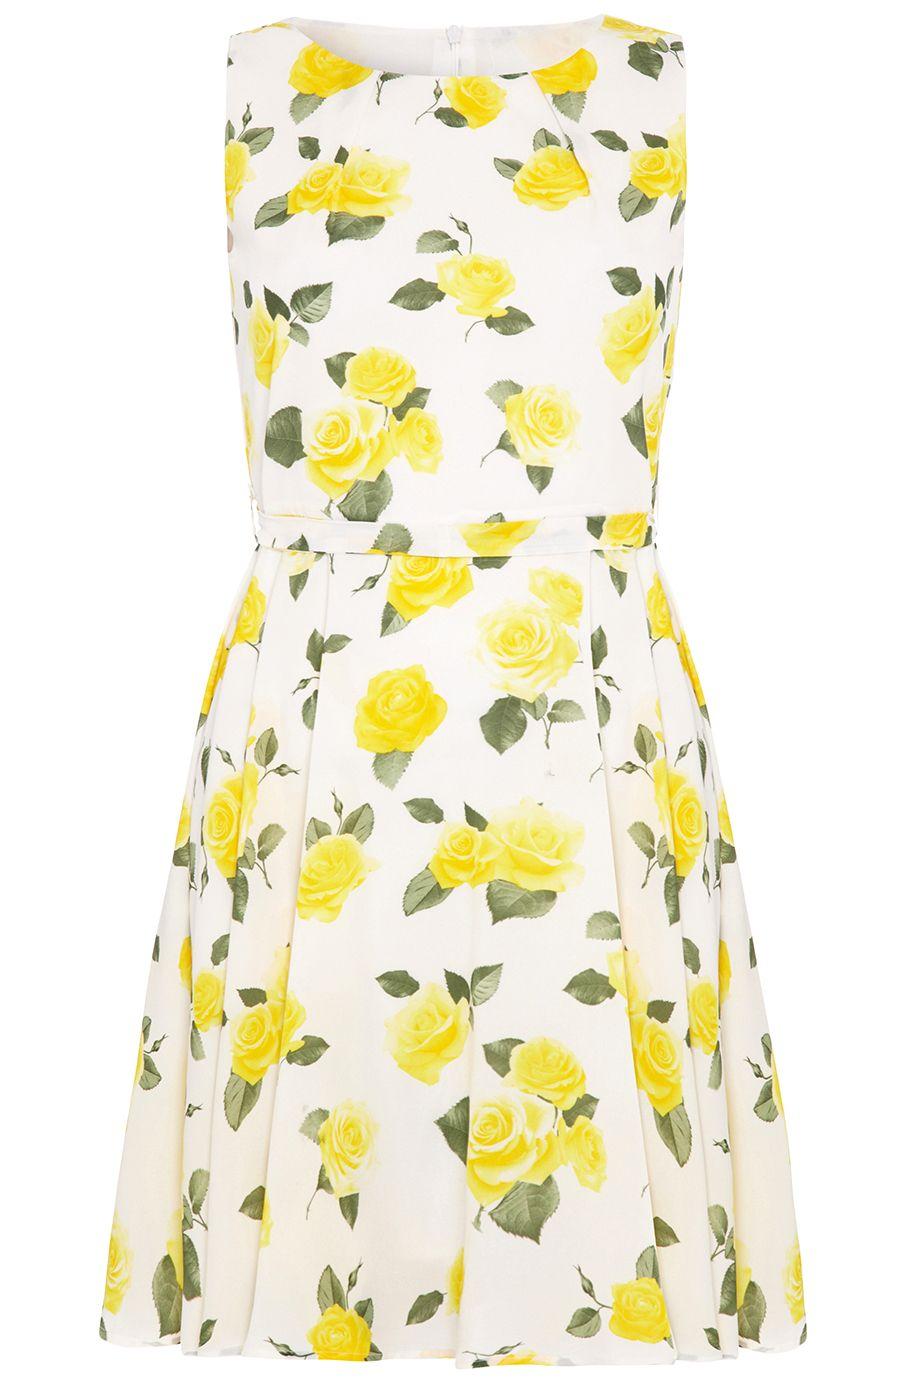 Yellow Roses Prom Dress White A Line Dress Fit Flare Dress Dresses [ 1380 x 920 Pixel ]